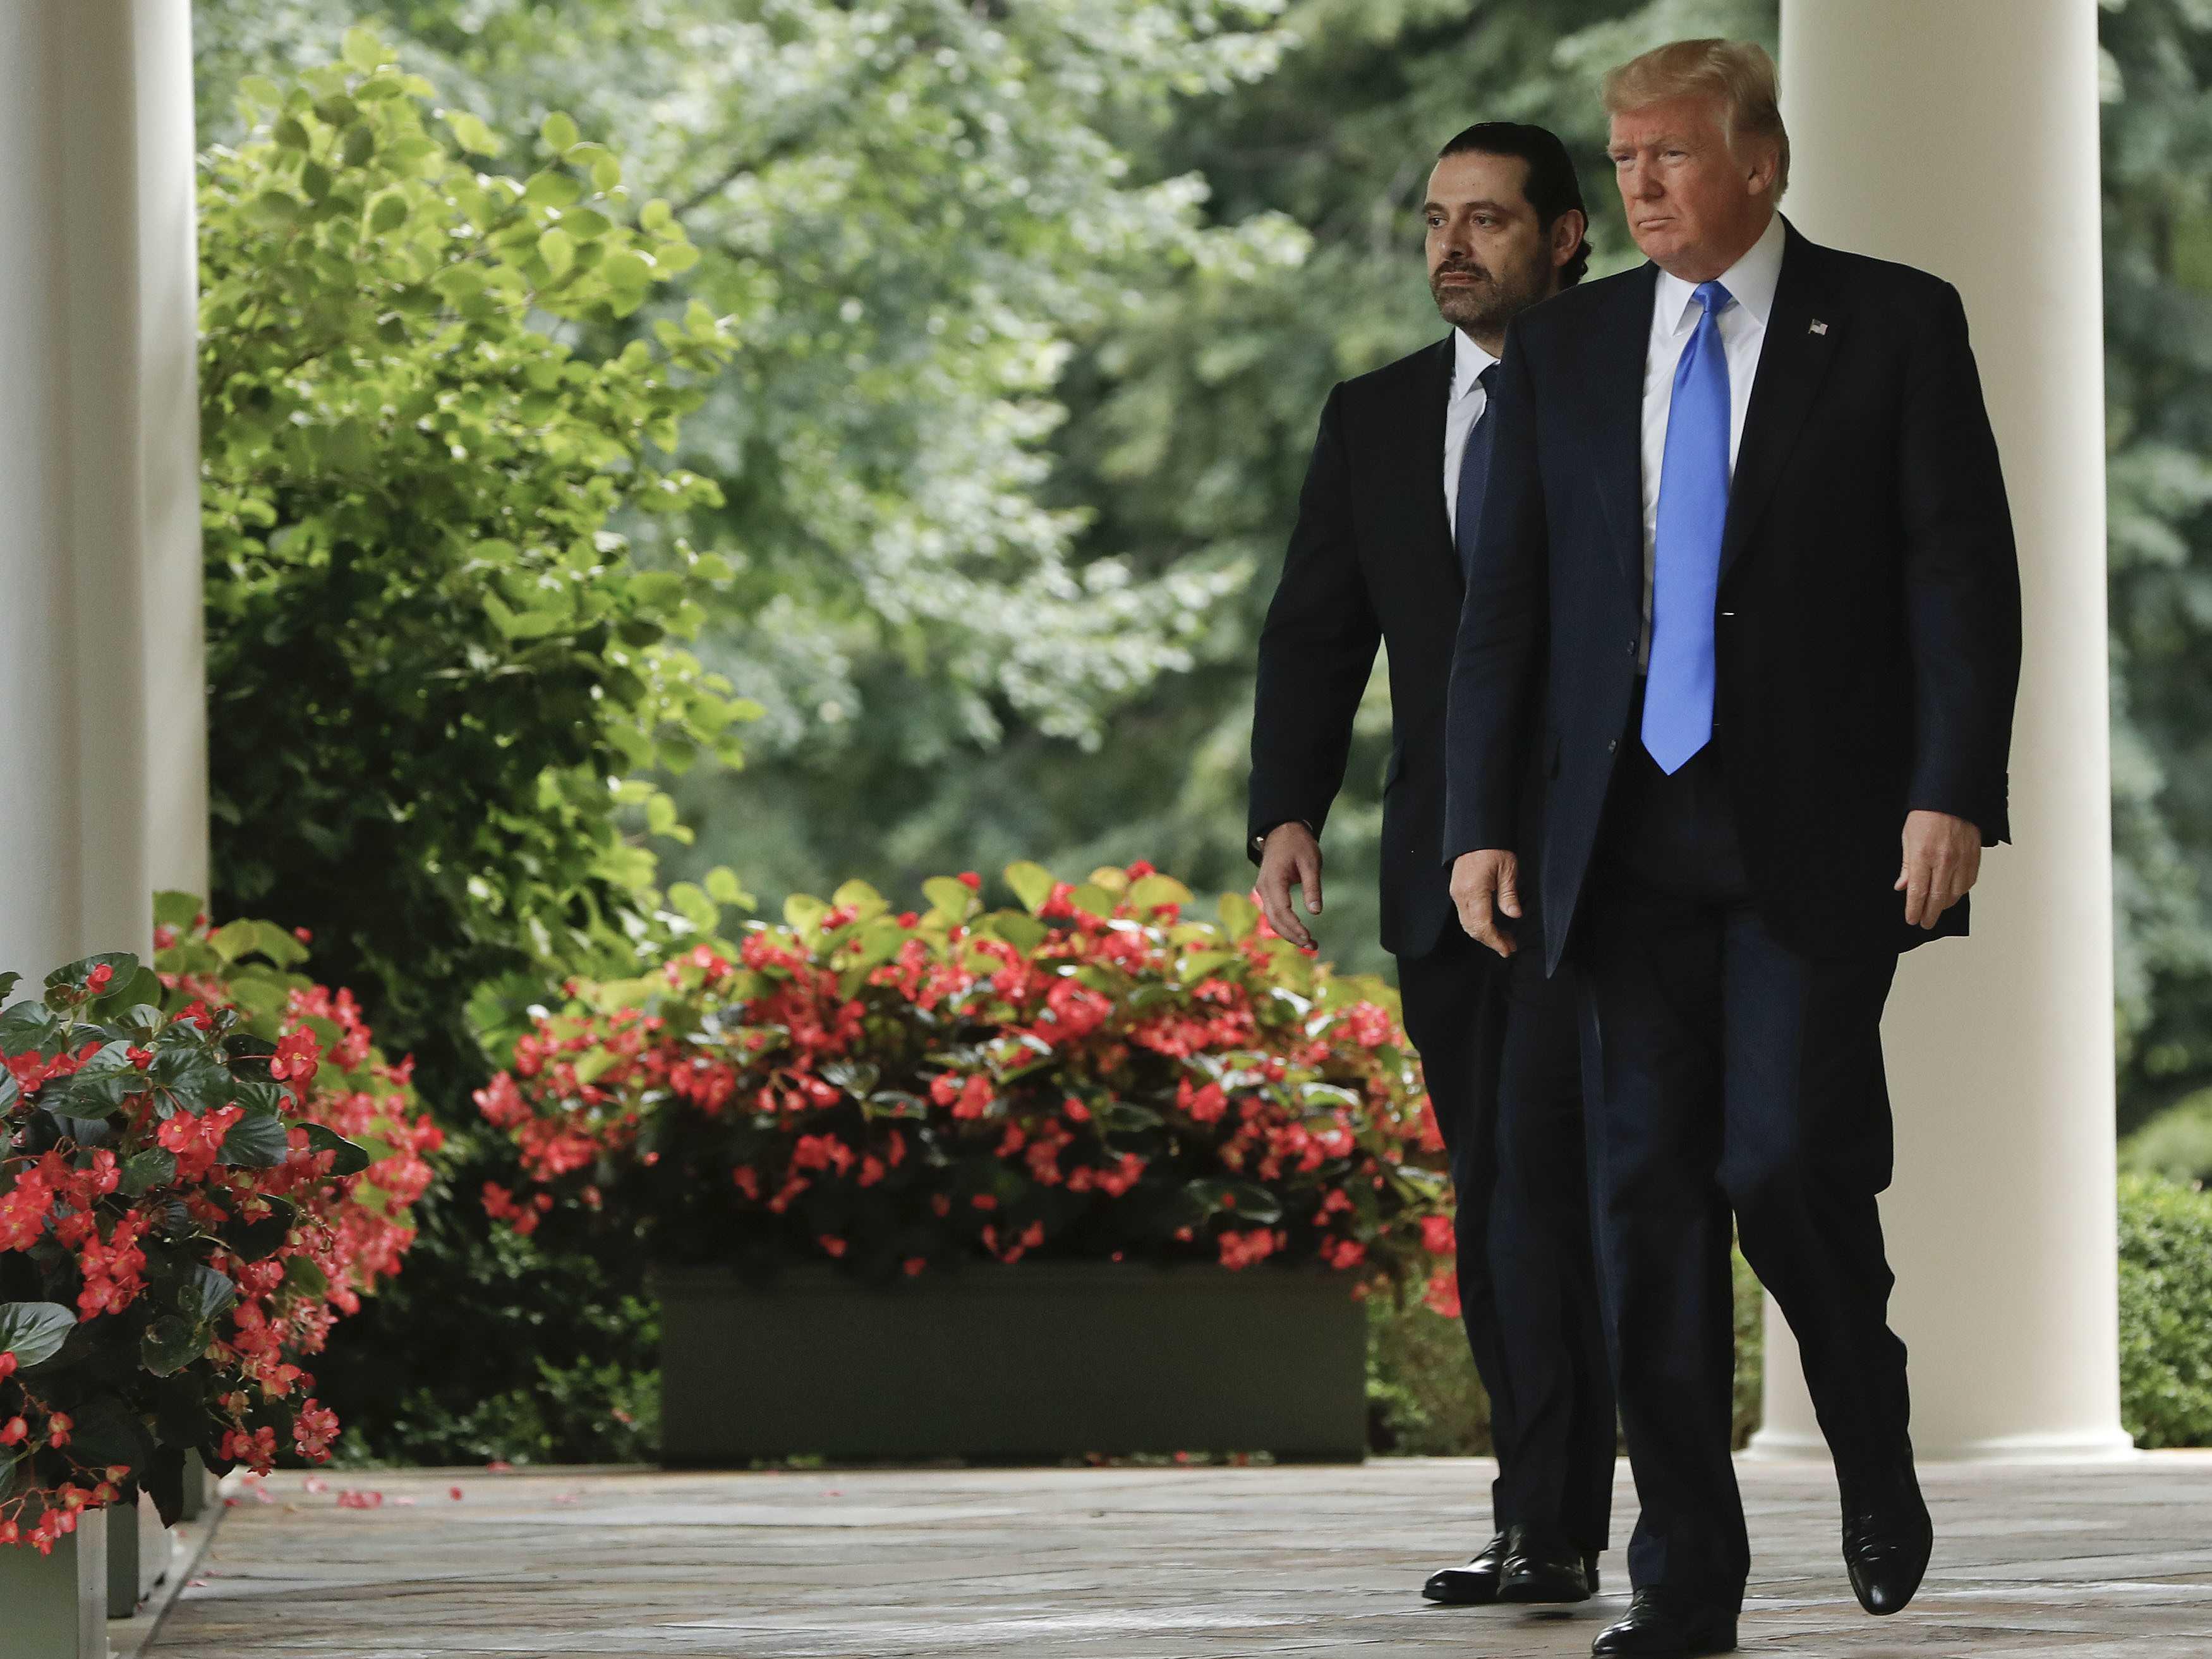 AP FACT CHECK: Trump Misfires on Mideast